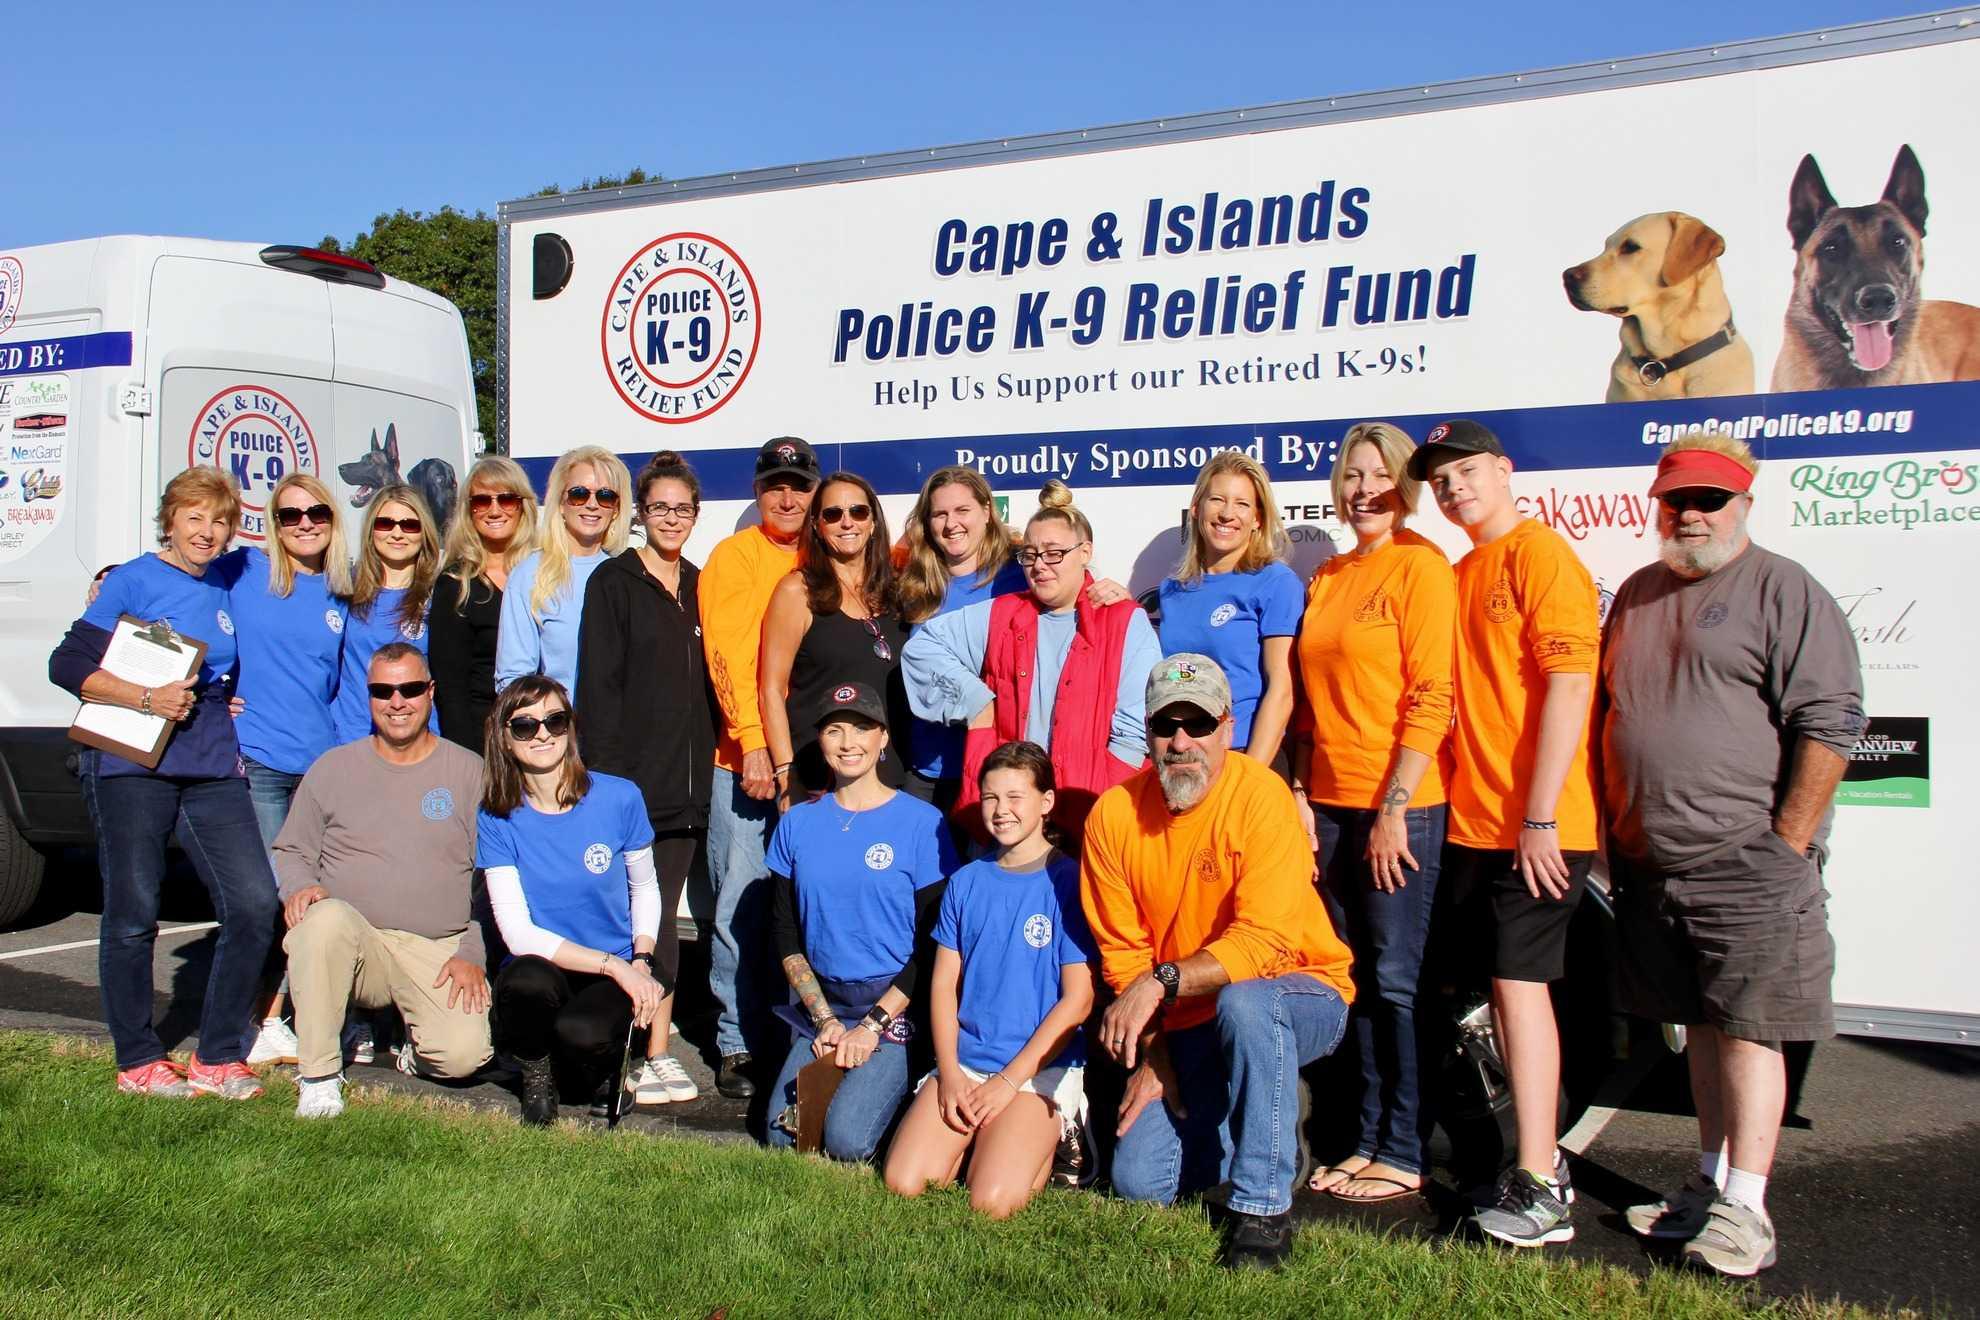 Cape & Islands volunteers group photo